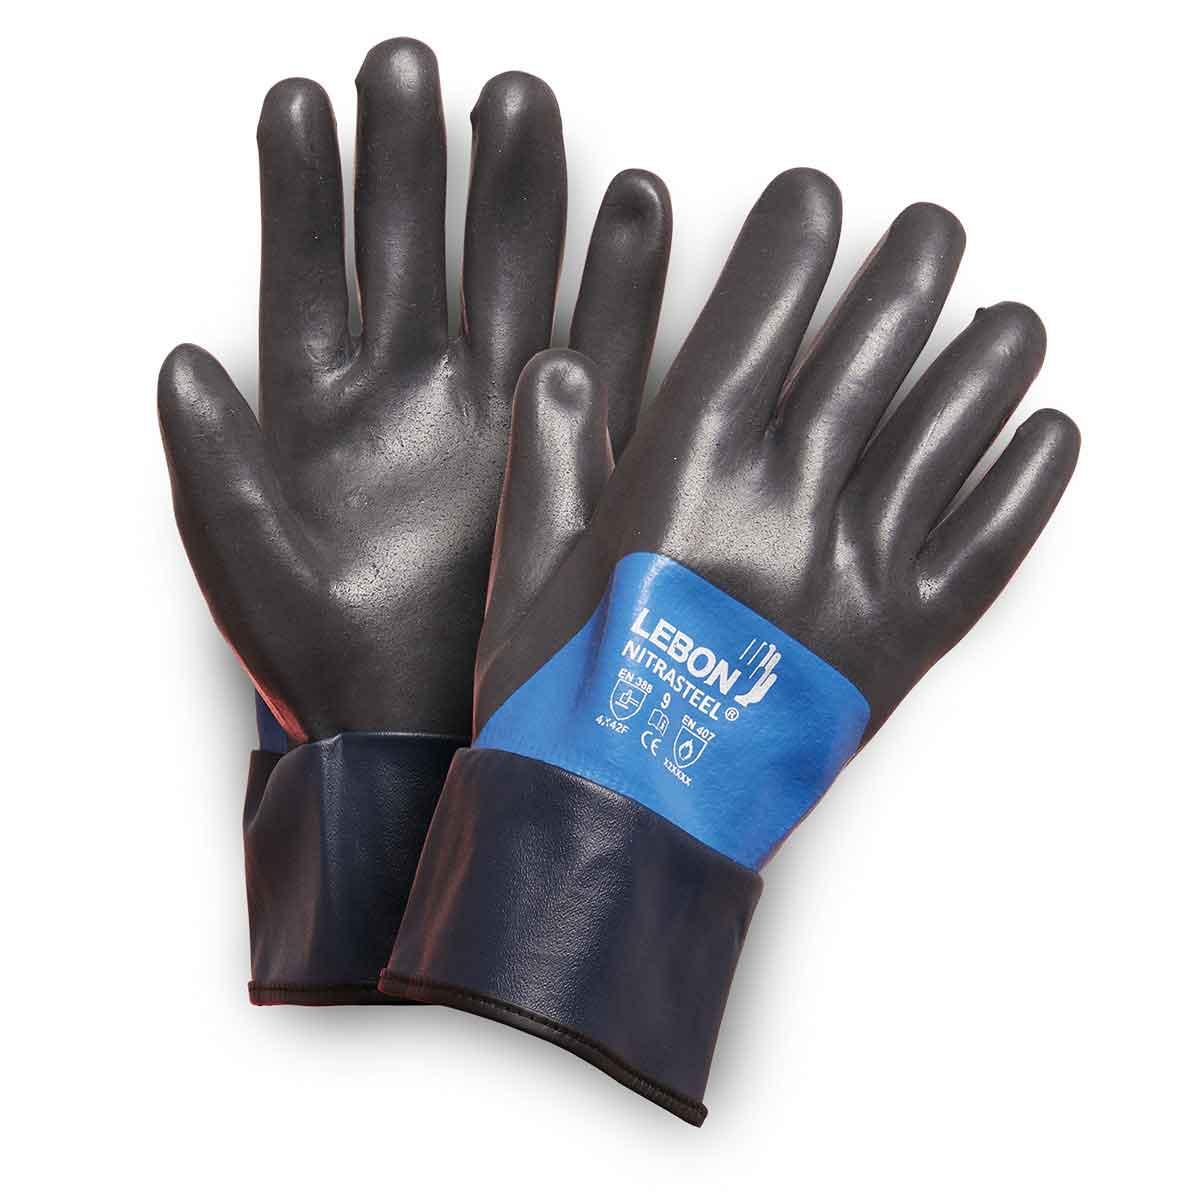 Gants Nitrasteel Lebon Protection